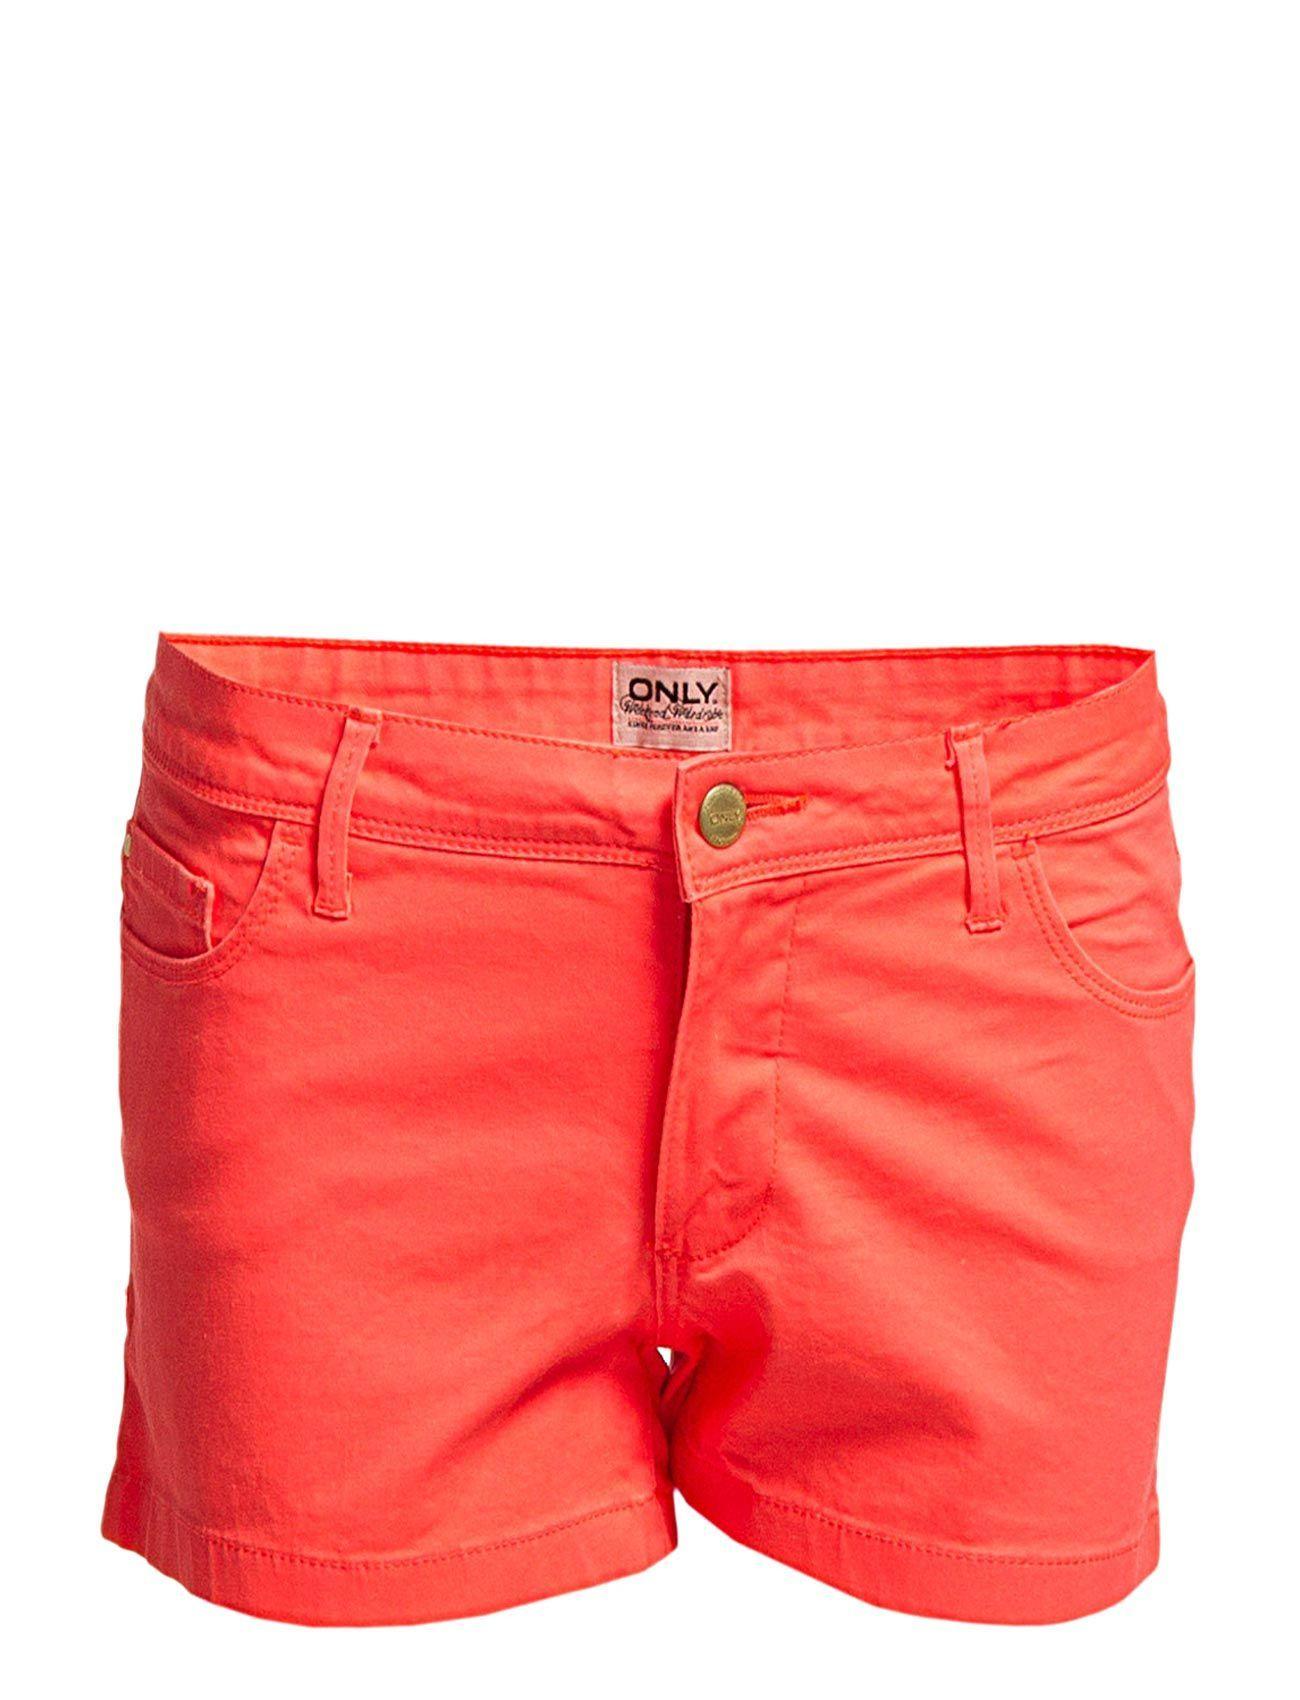 Skinny Low Liva Shorts